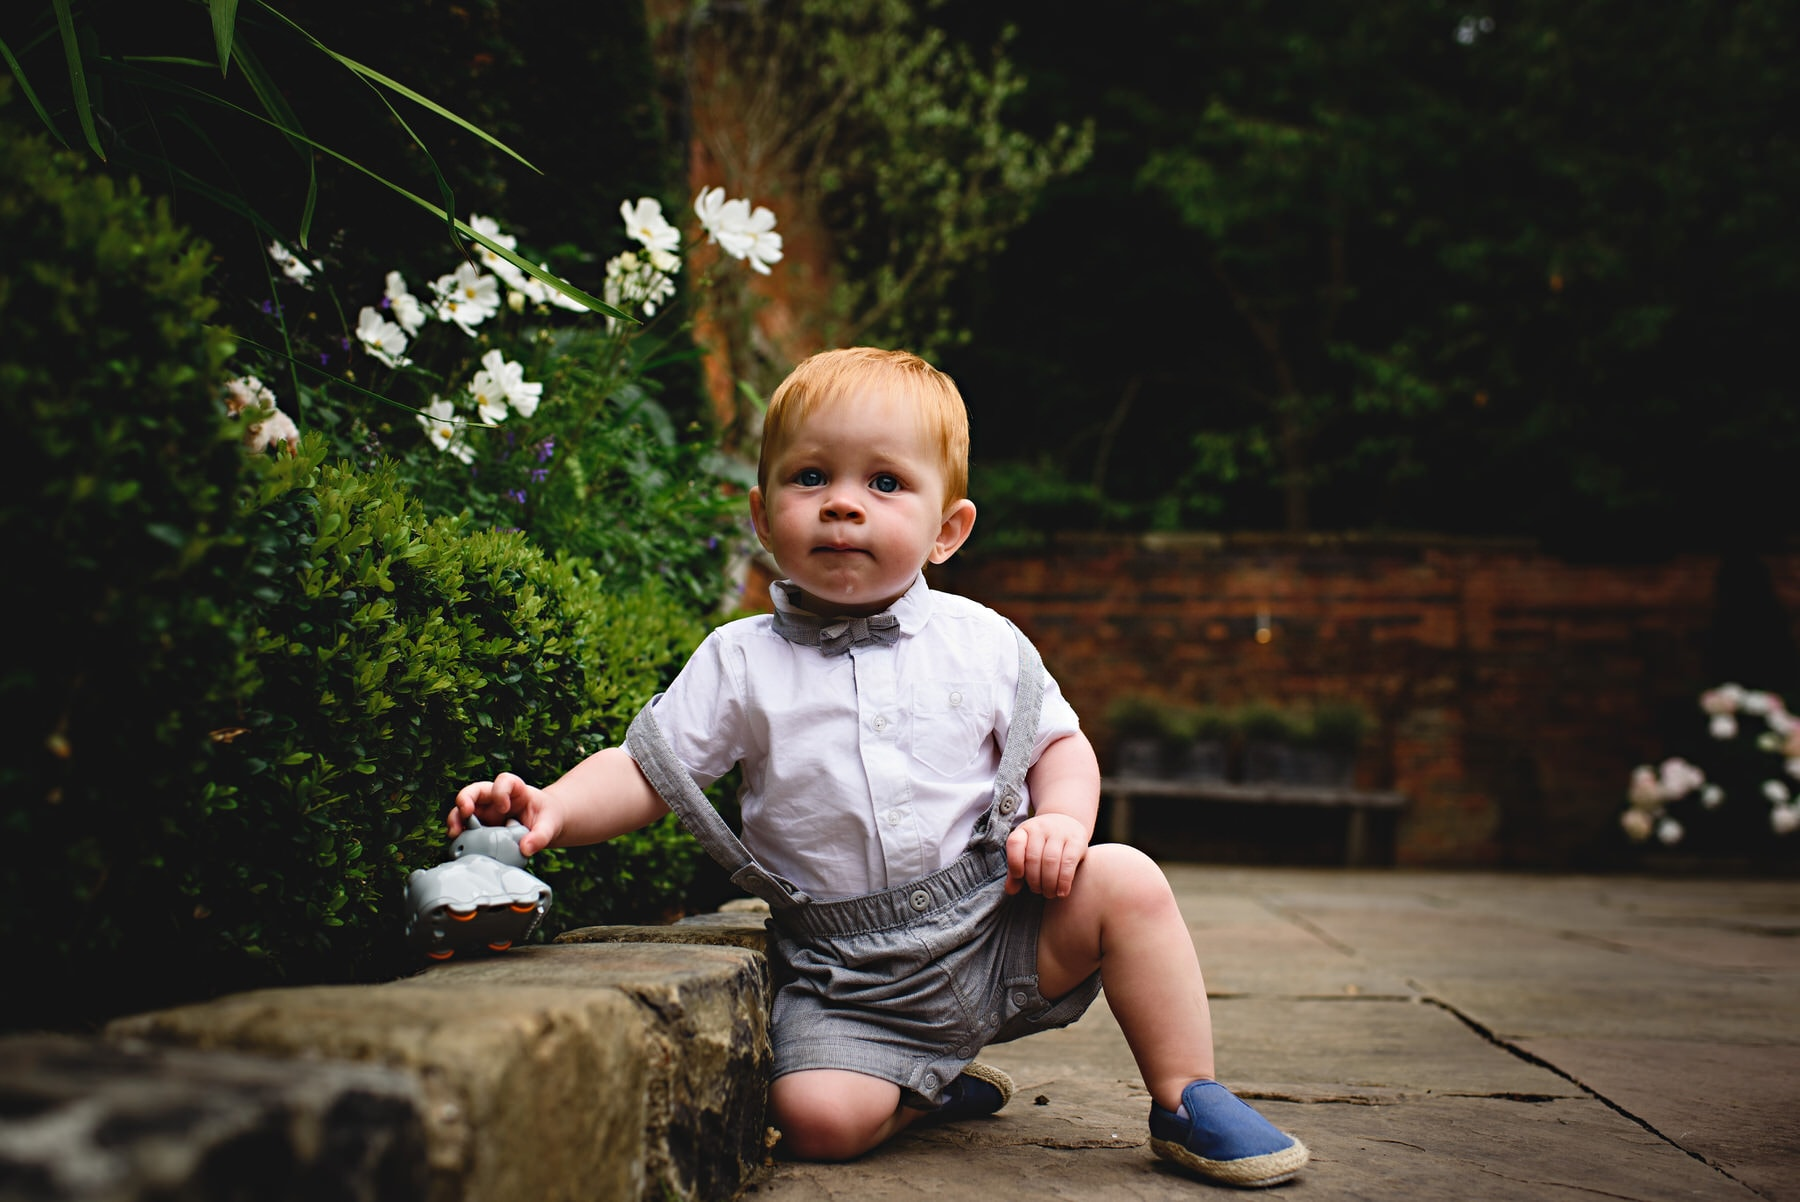 young child at Shustoke Barns in Warwickshire